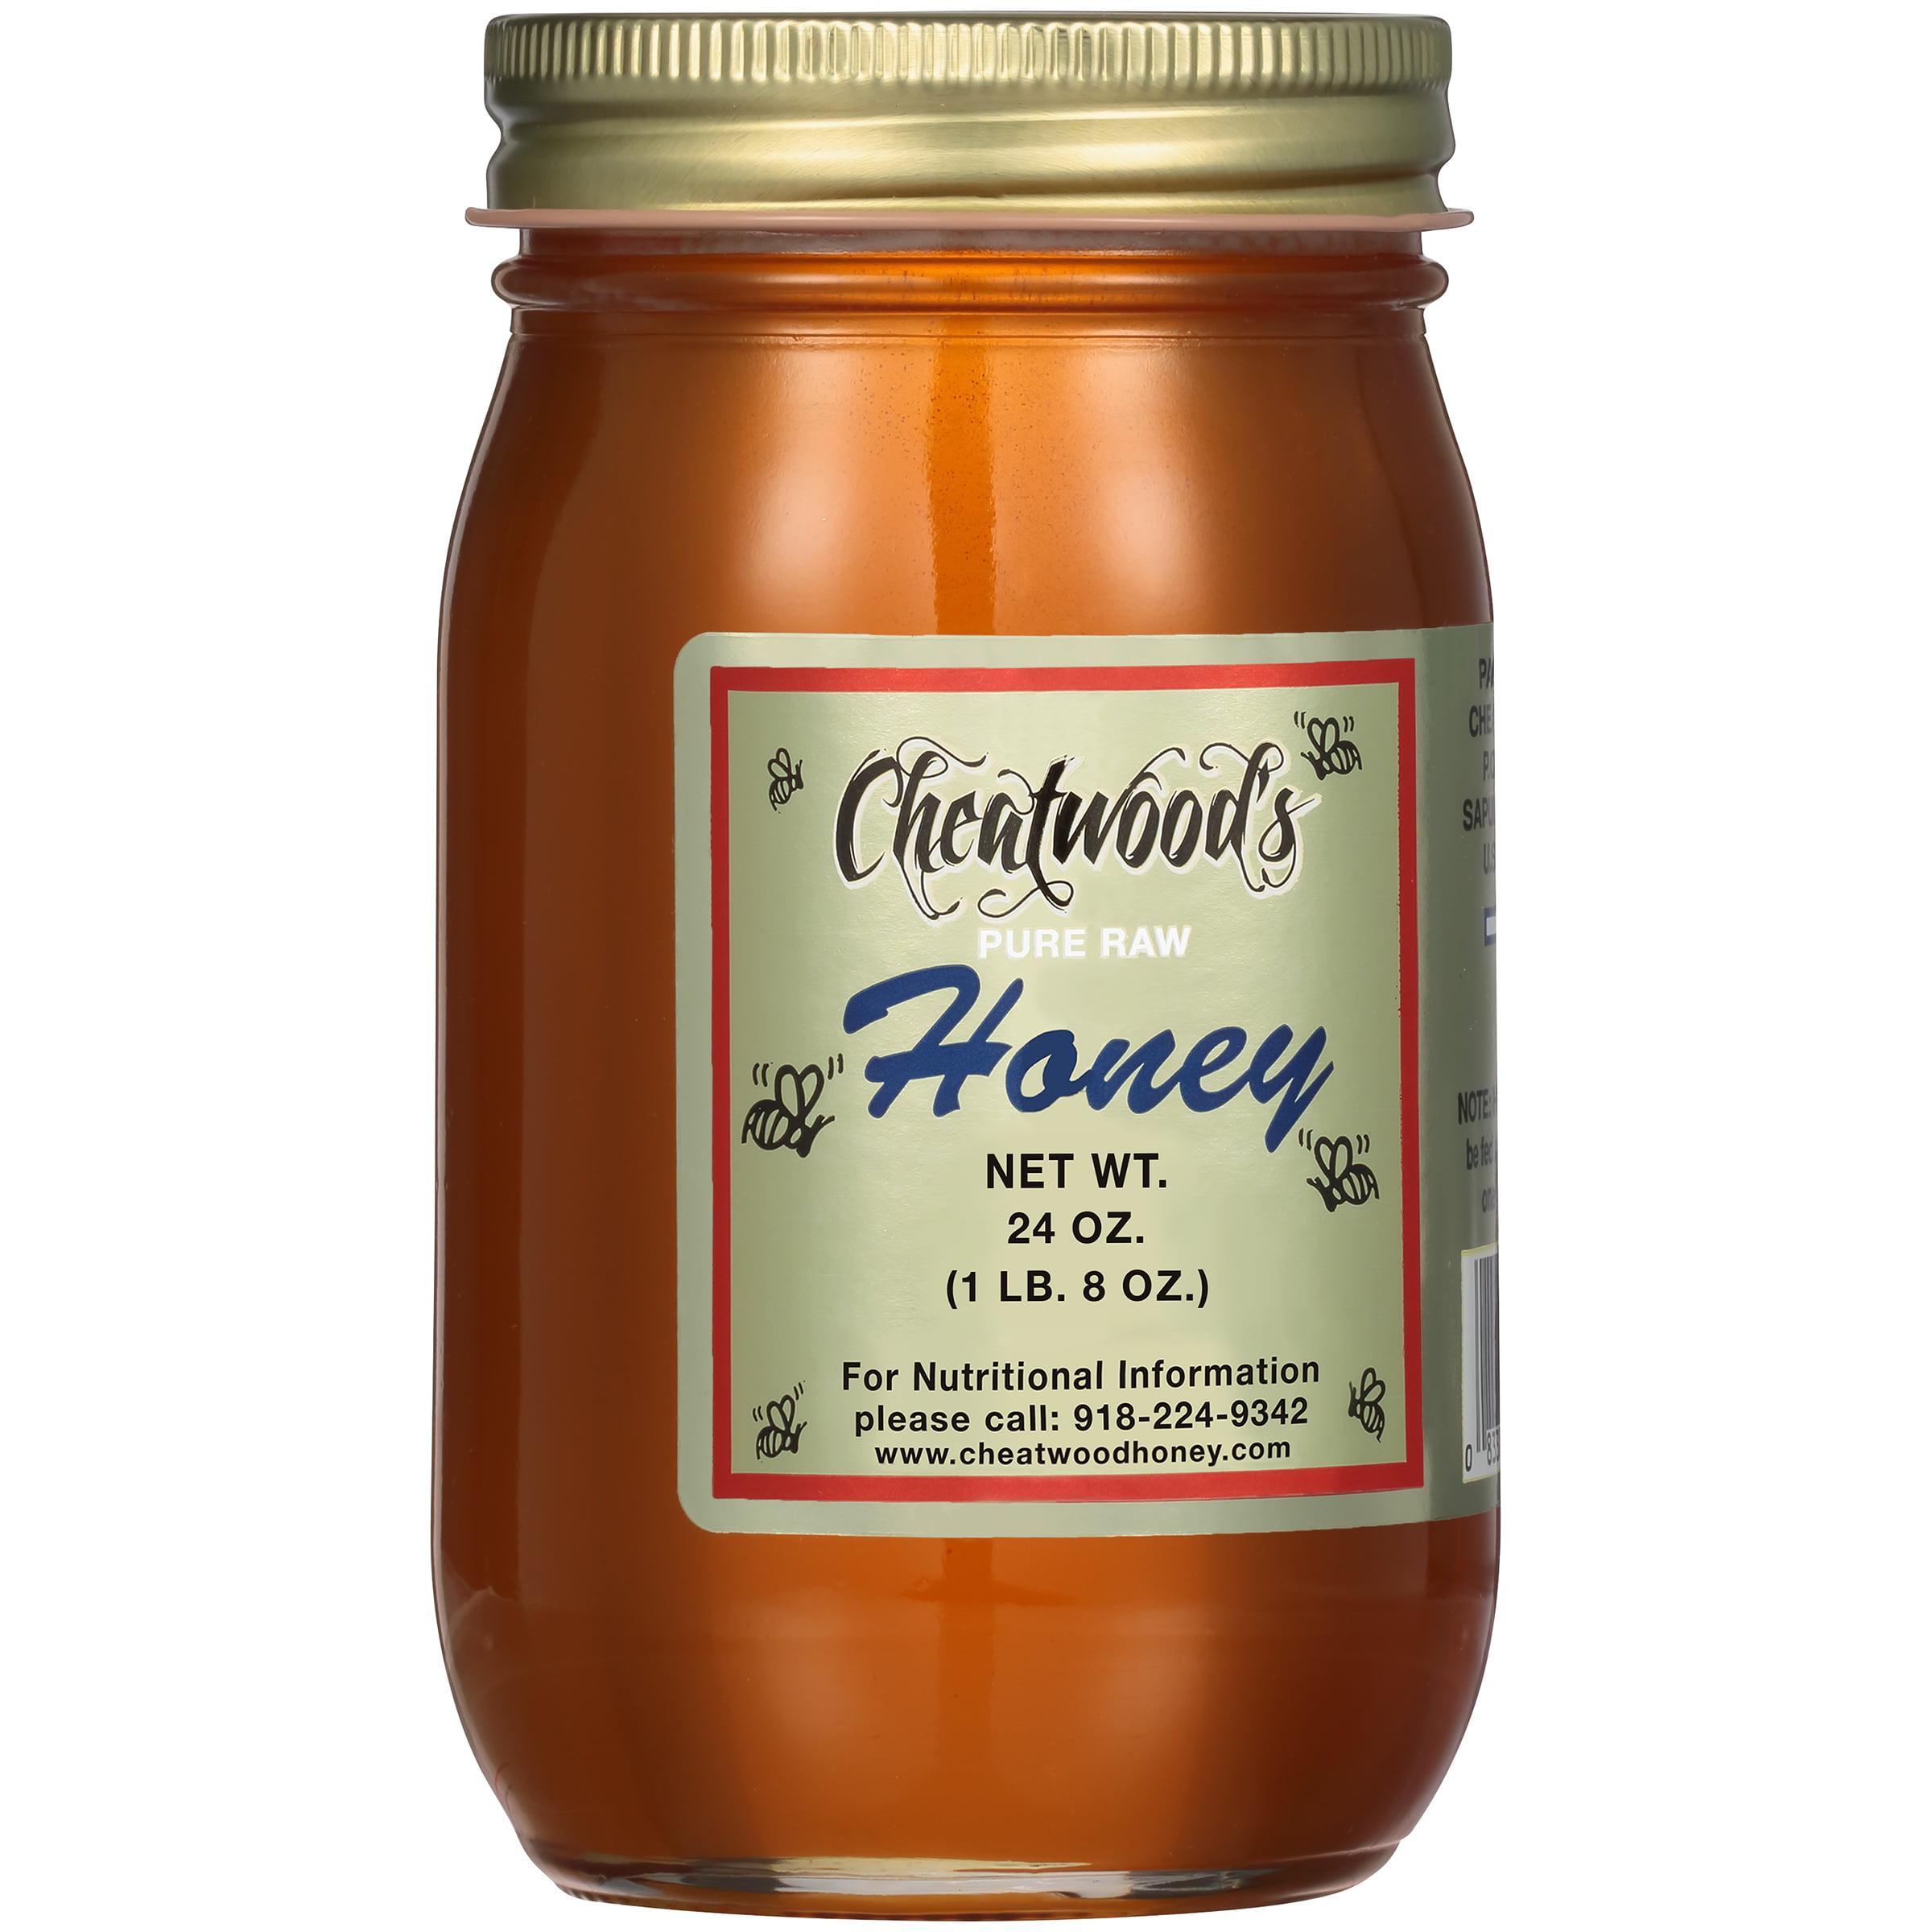 Cheatwood's Pure Raw Honey 24 oz. Jar by Cheatwood Ltd.